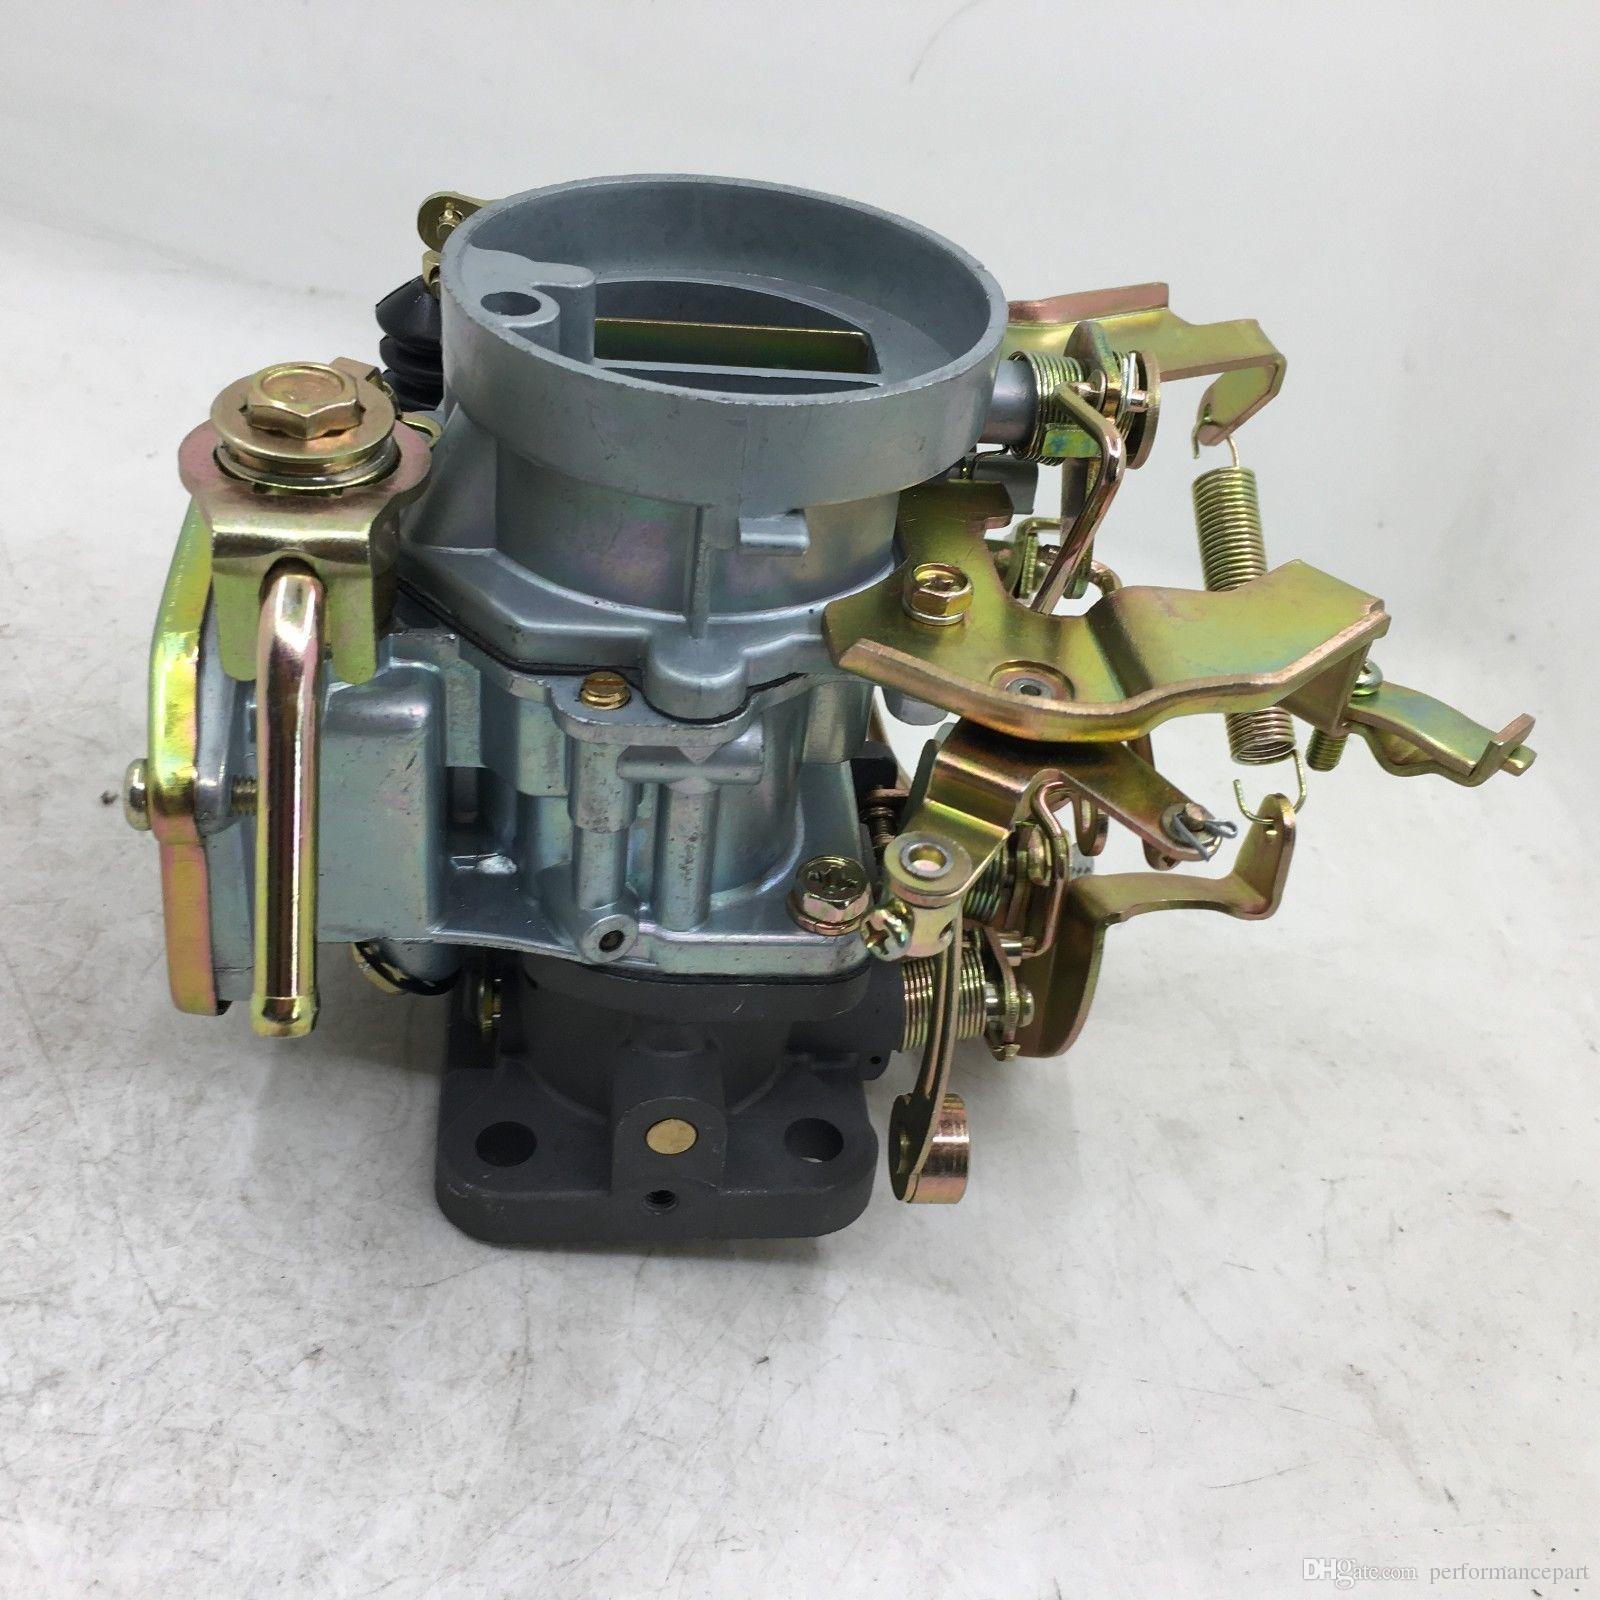 Carb fit DATSUN 520 521 620 720 J16 J13 J15 ENGINE CARBURETOR NIKKI  #16010-03W02